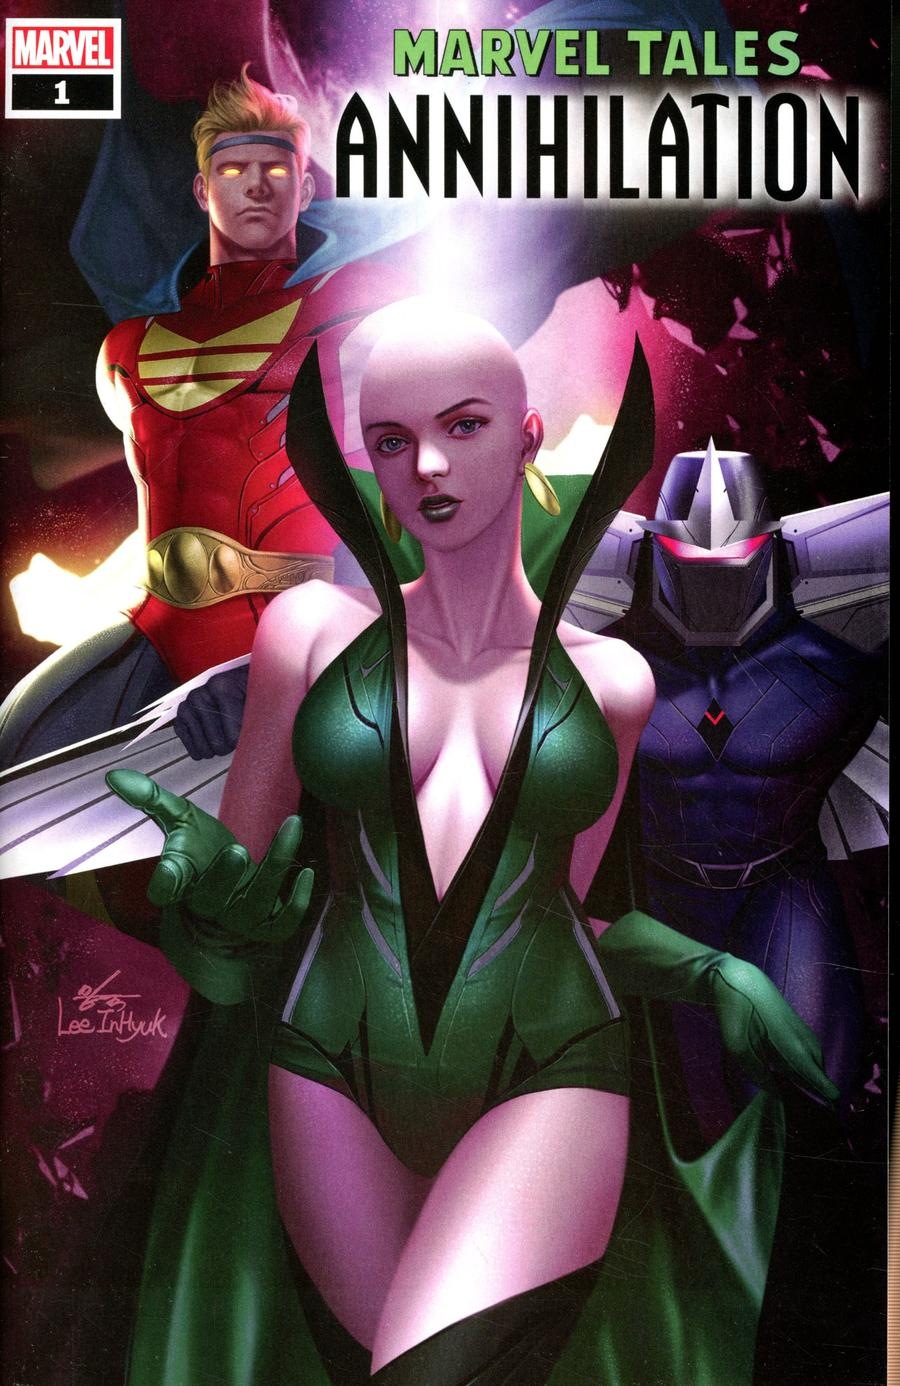 Marvel Tales Annihilation #1 Cover A Regular Inhyuk Lee Cover